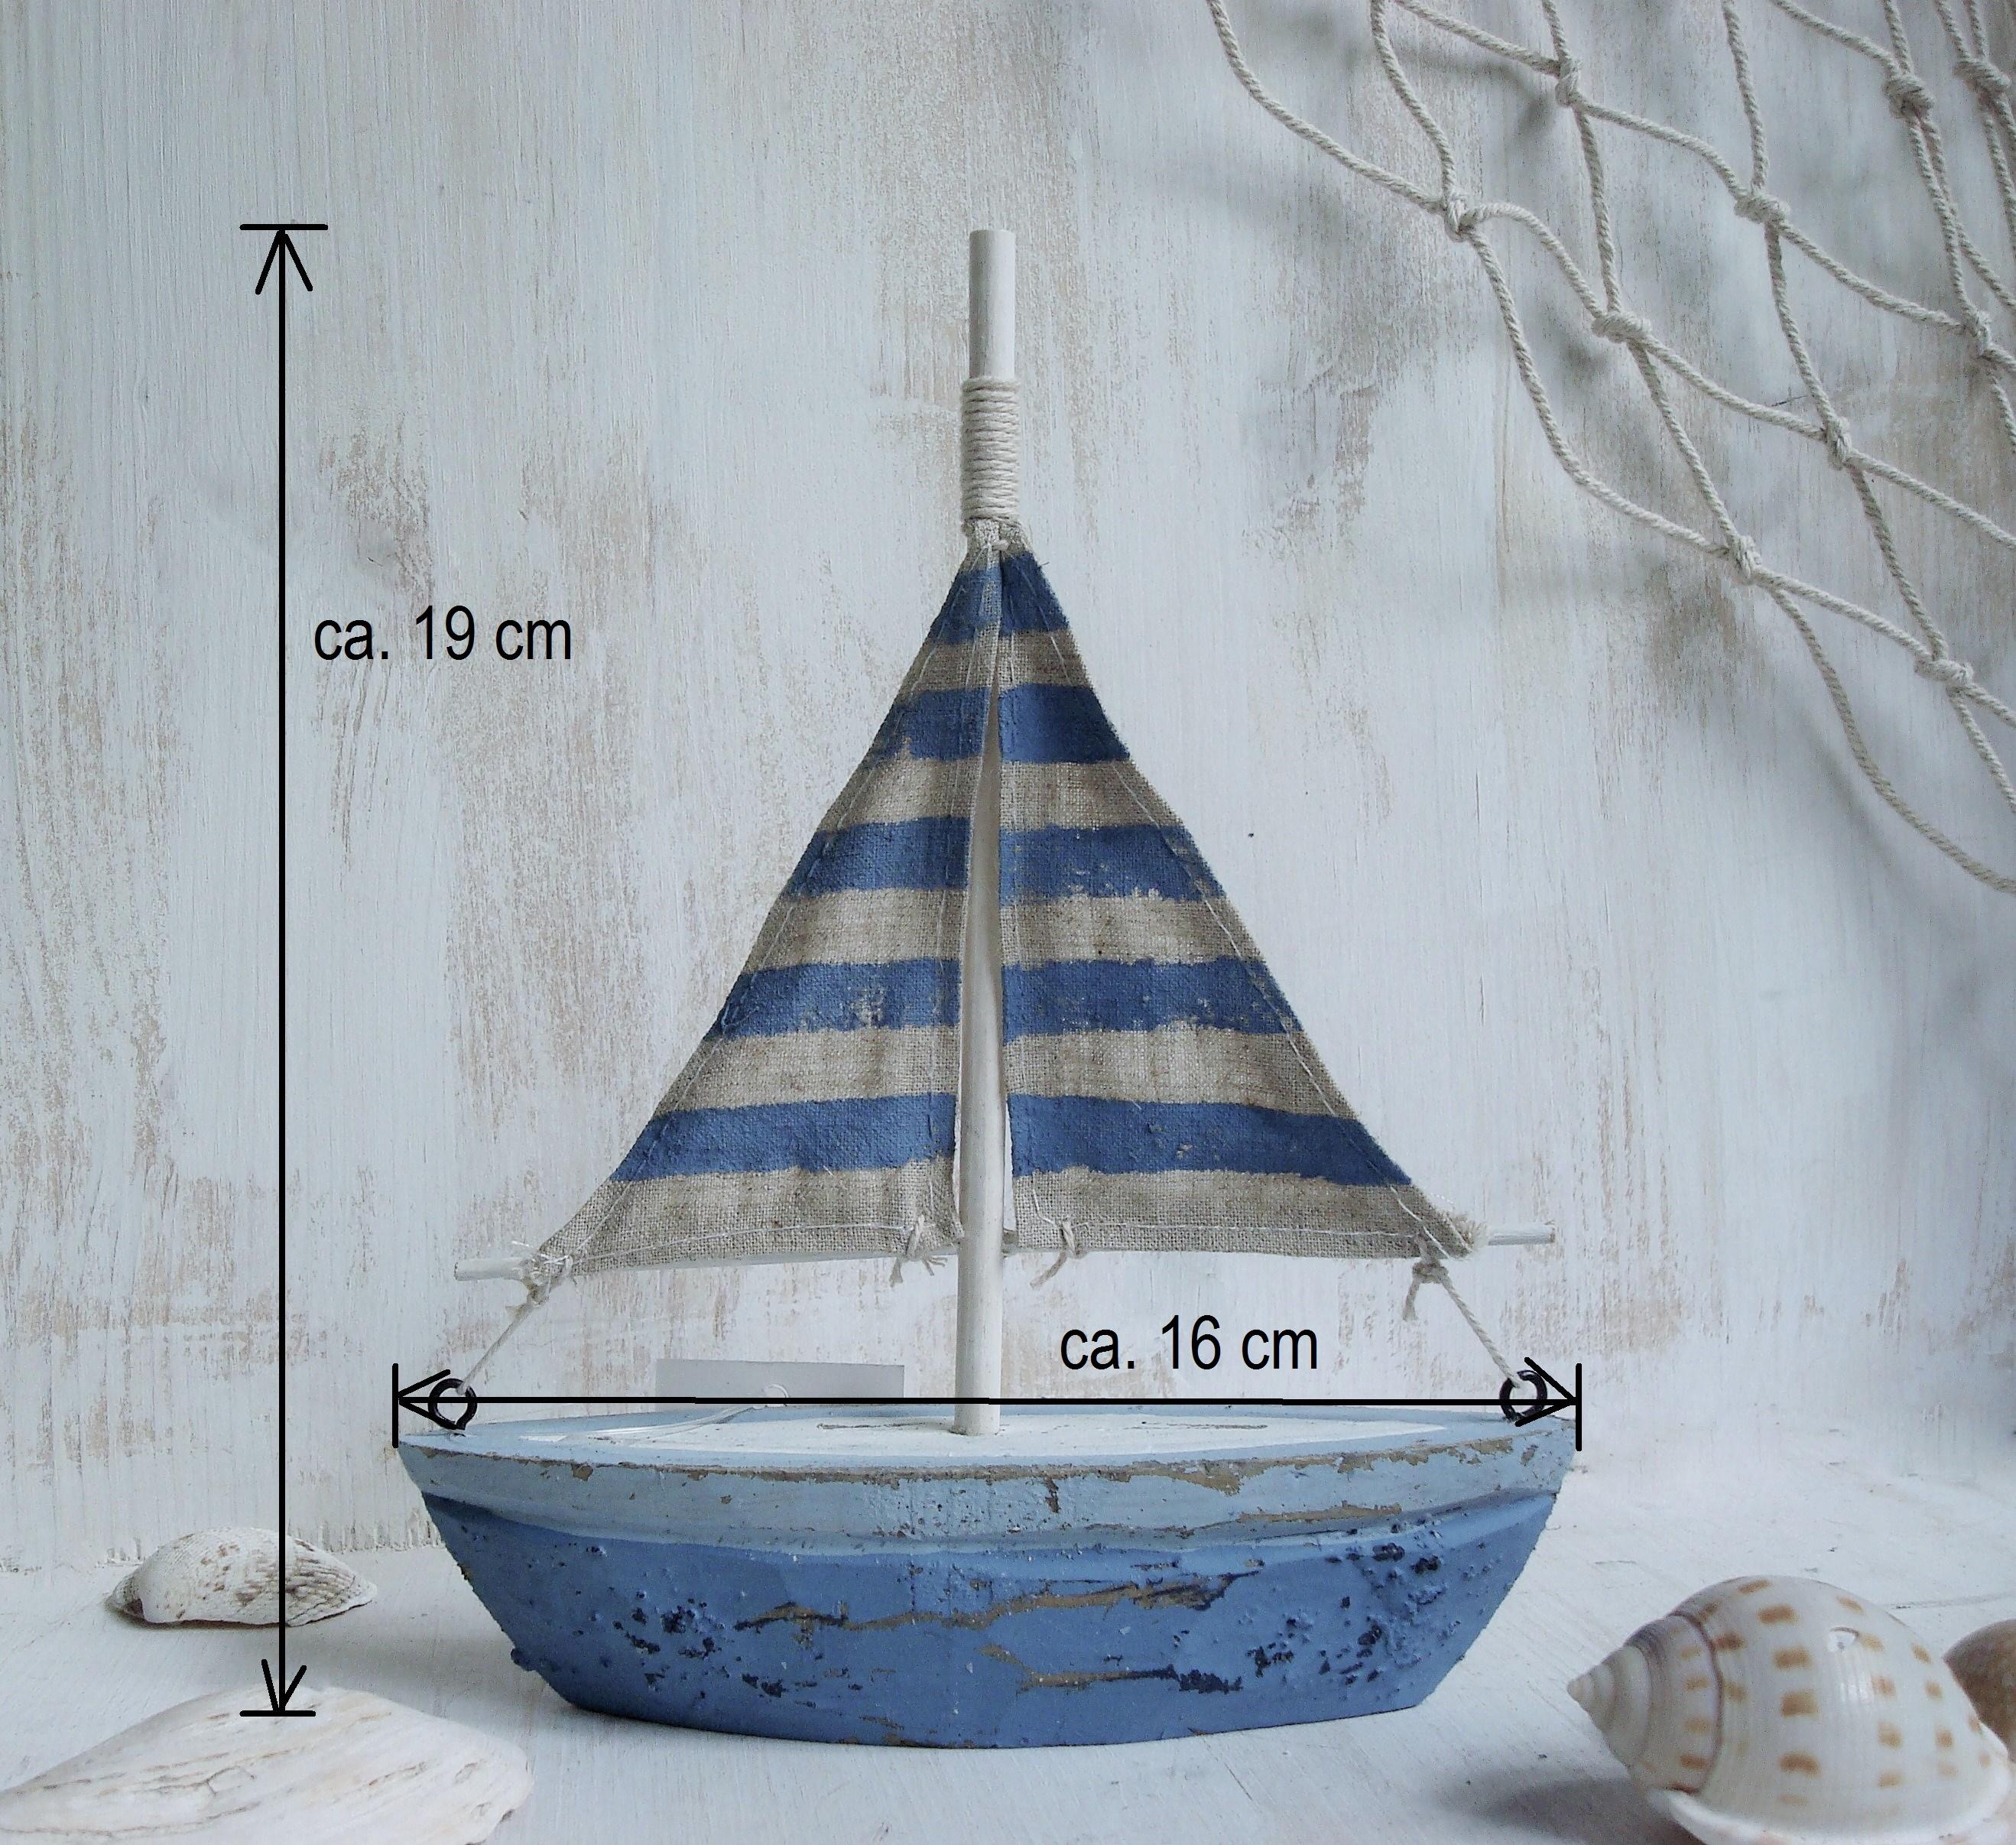 Deko Segelschiff 19cm Holz Boot K Ste Maritim Blau Wei